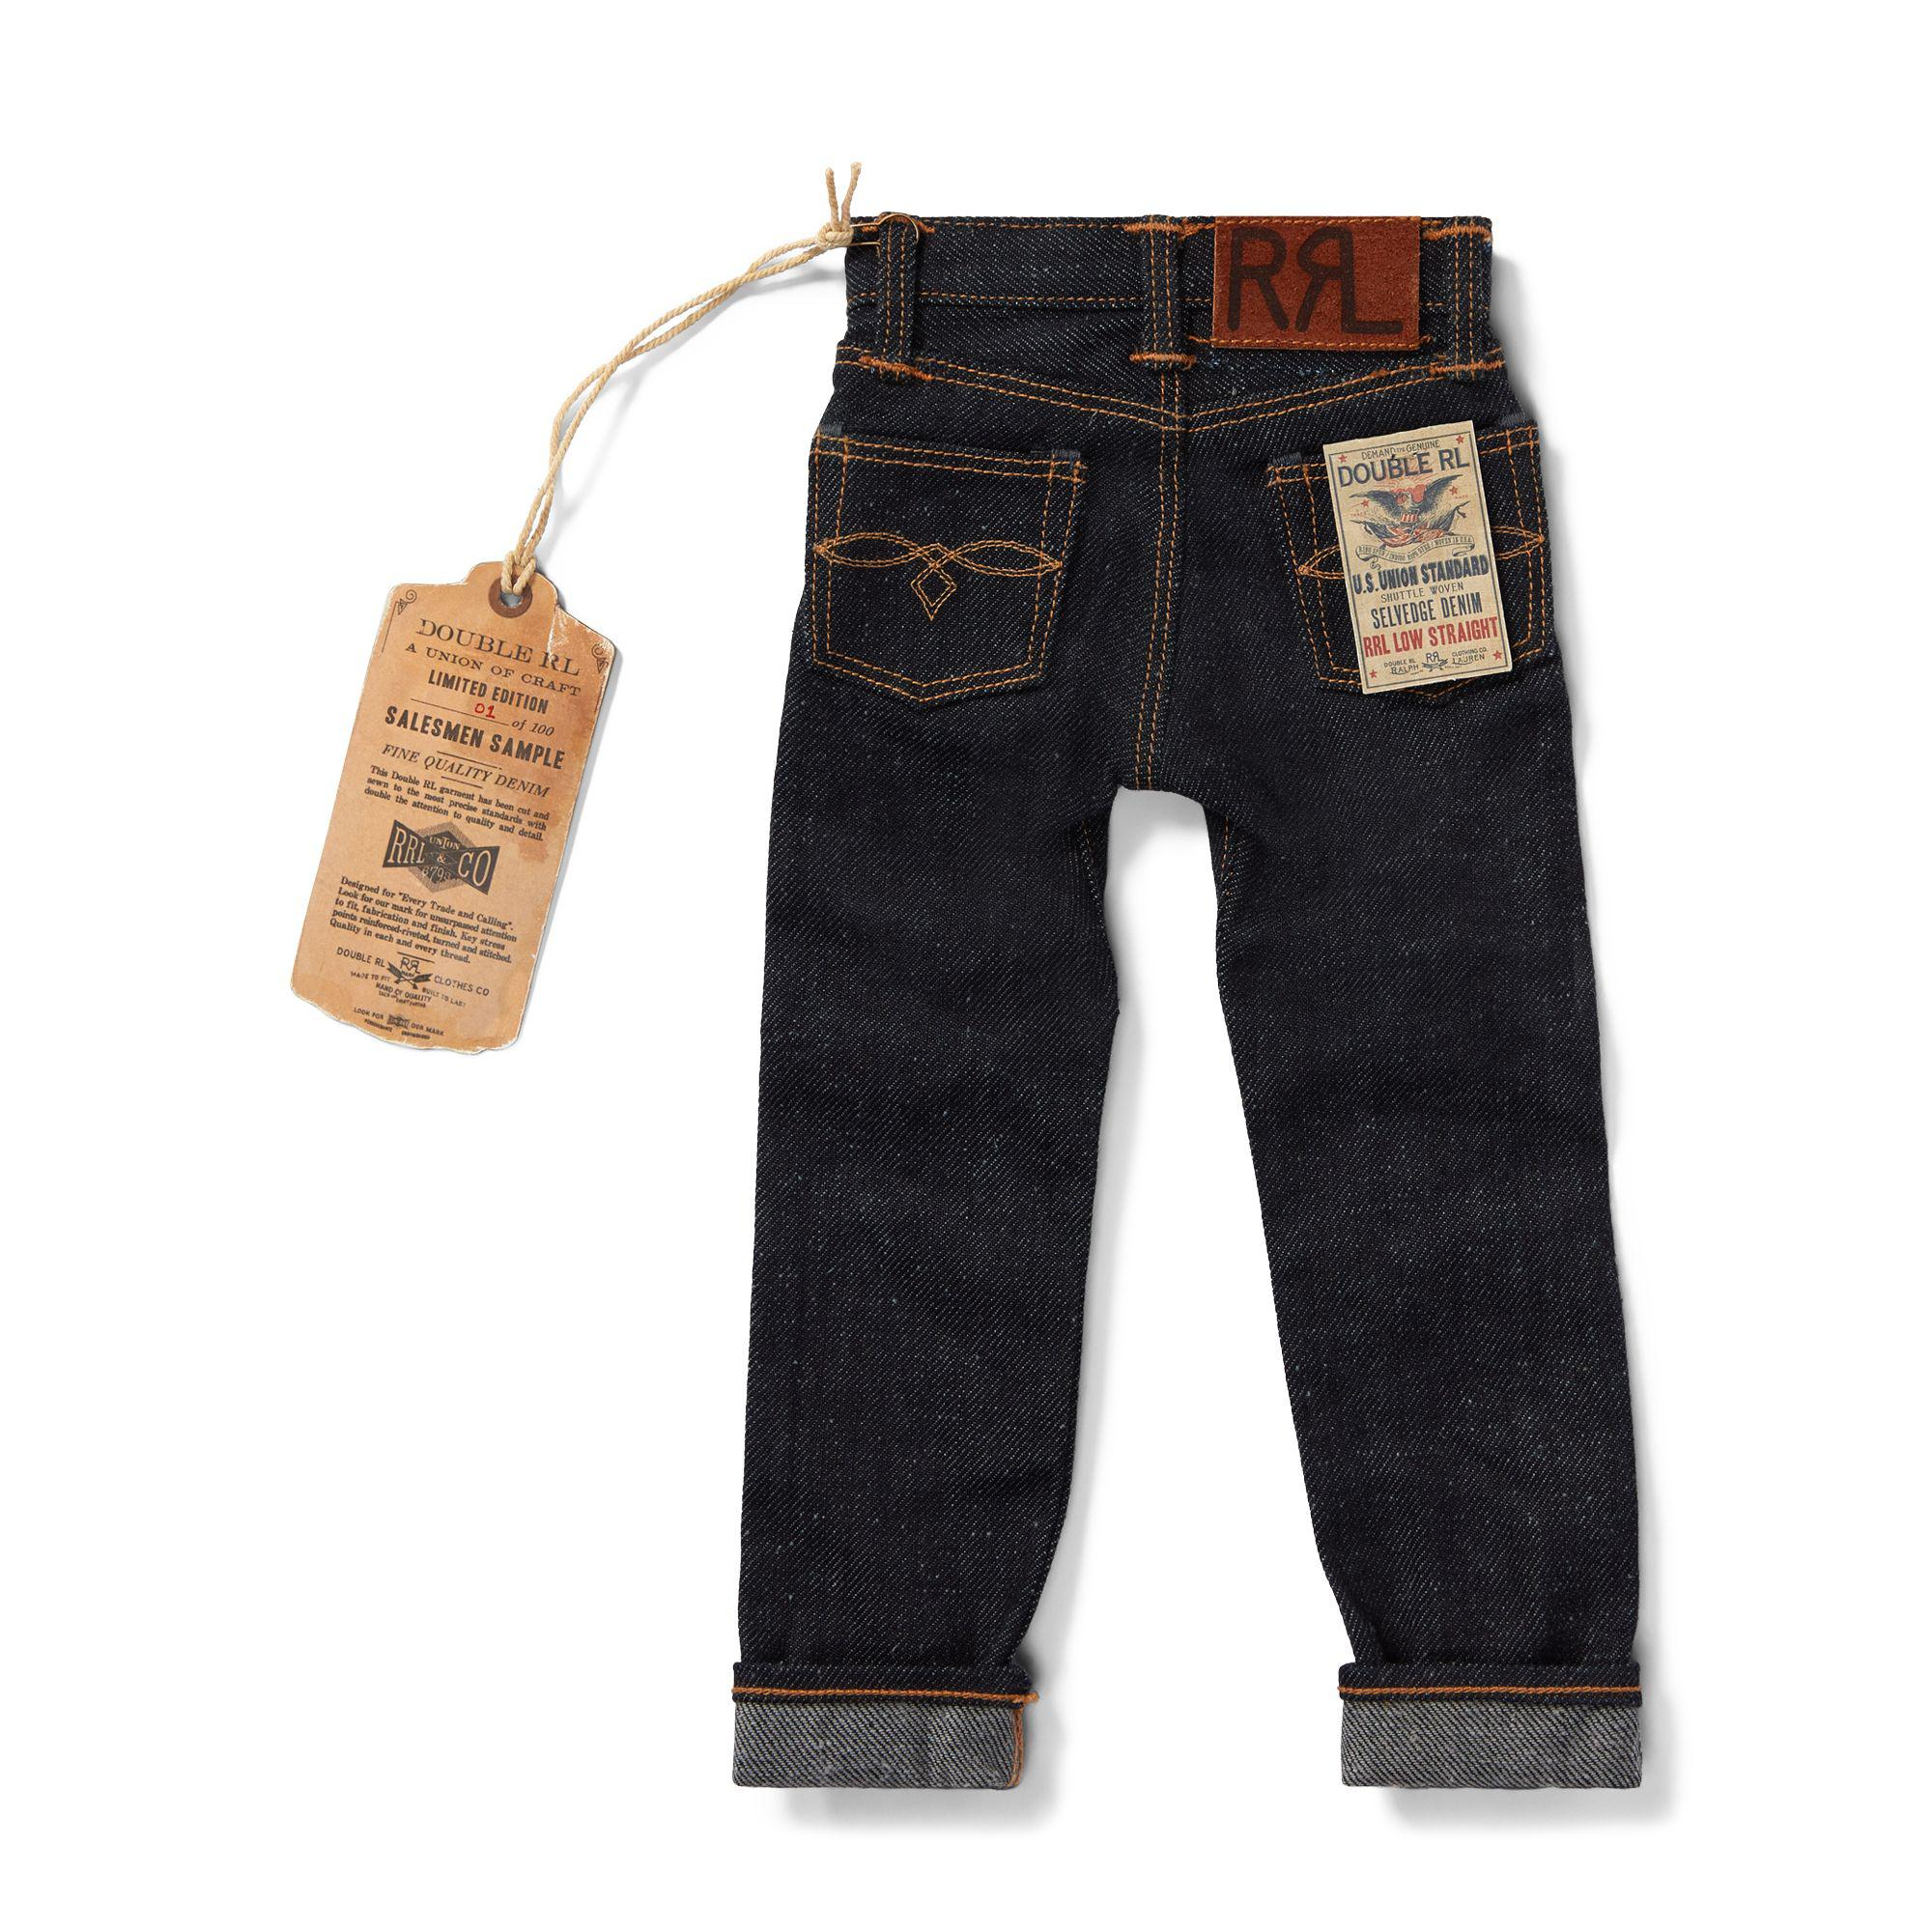 7ba0270fcd587 Lyst - Rrl Limited-edition Mini Jean for Men